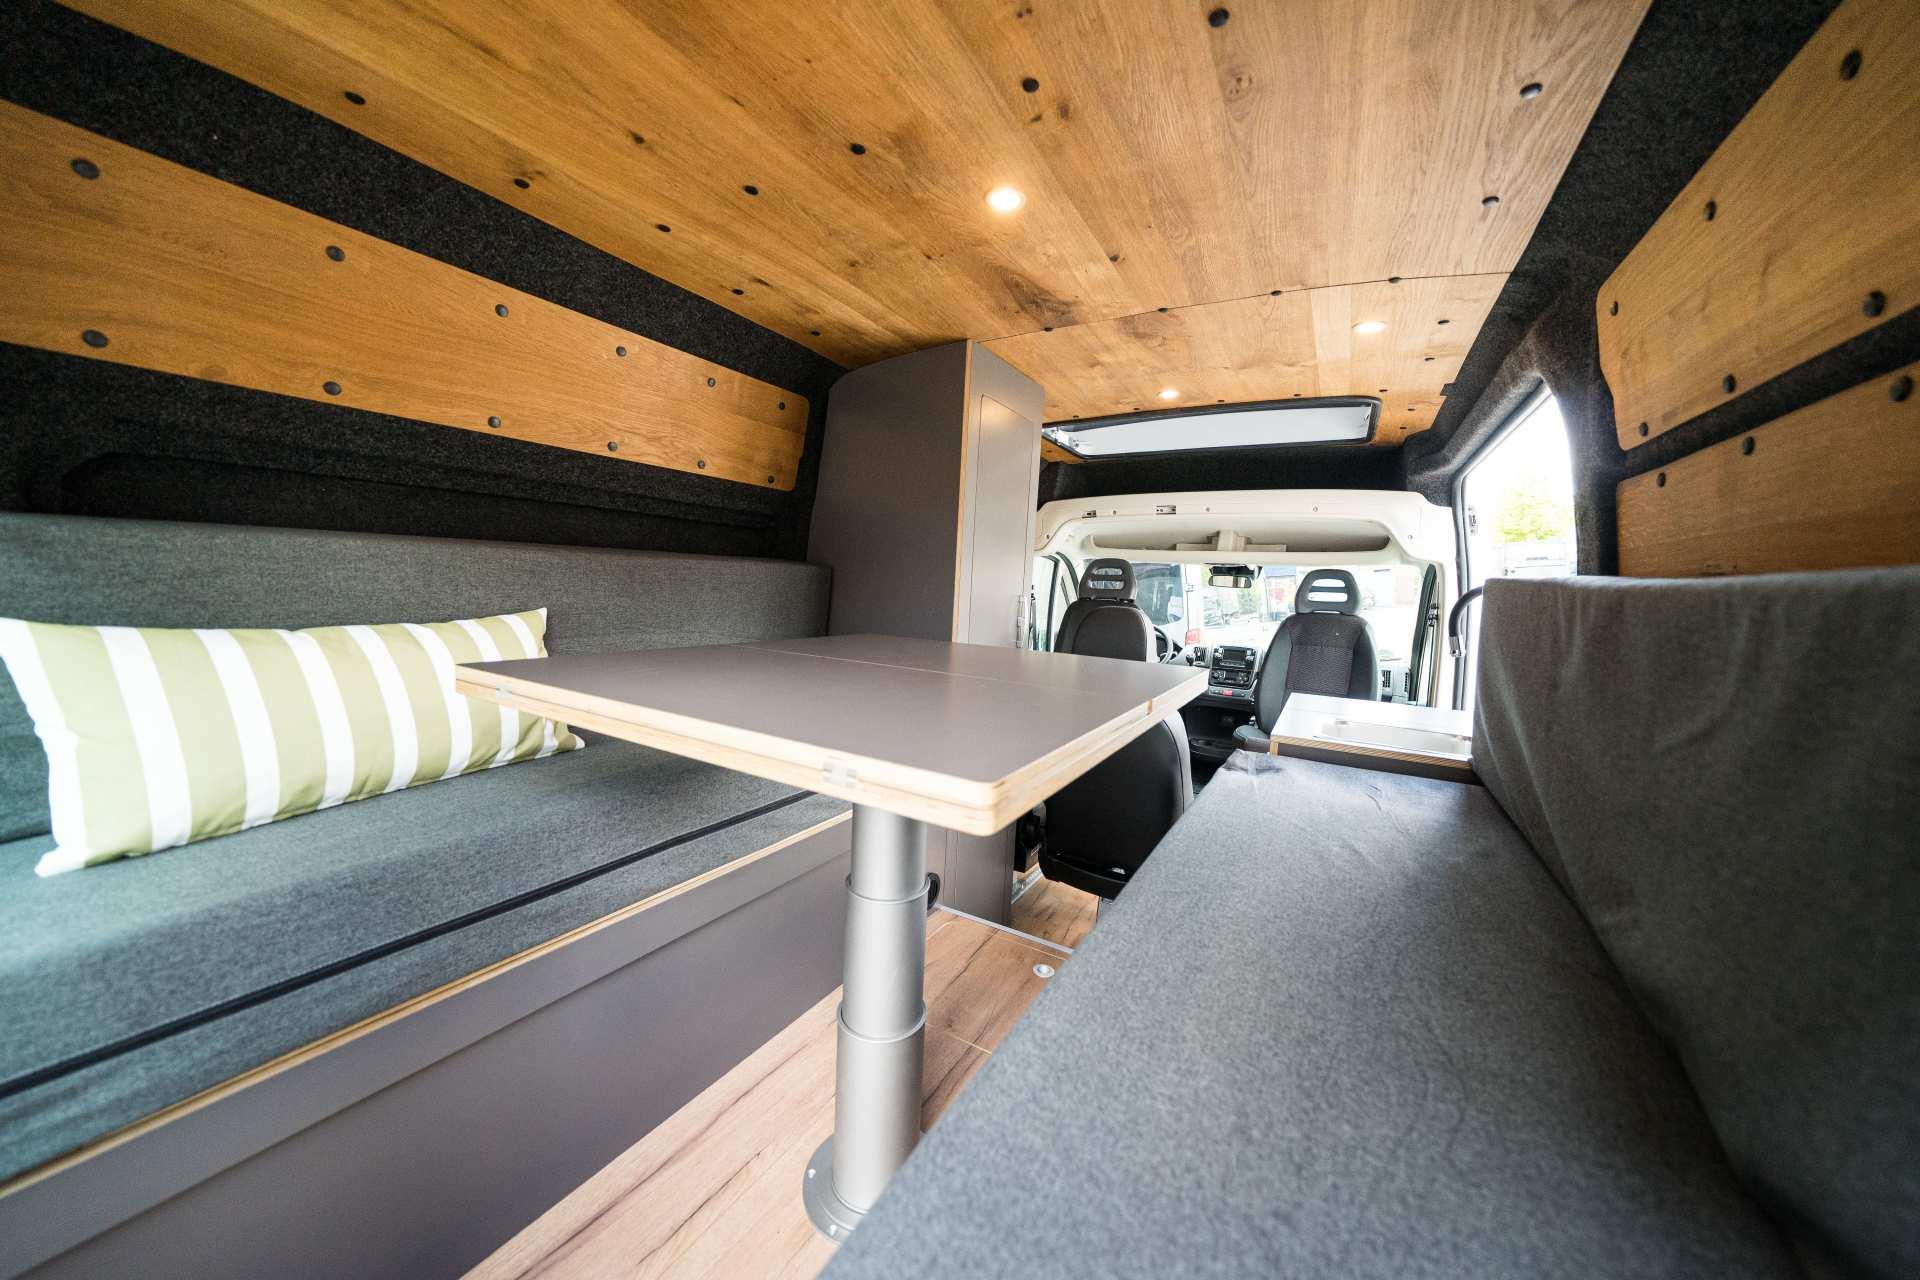 Individualausbau: Zwei-Raumwohnung Peugeot Boxer L2 H2 - 14